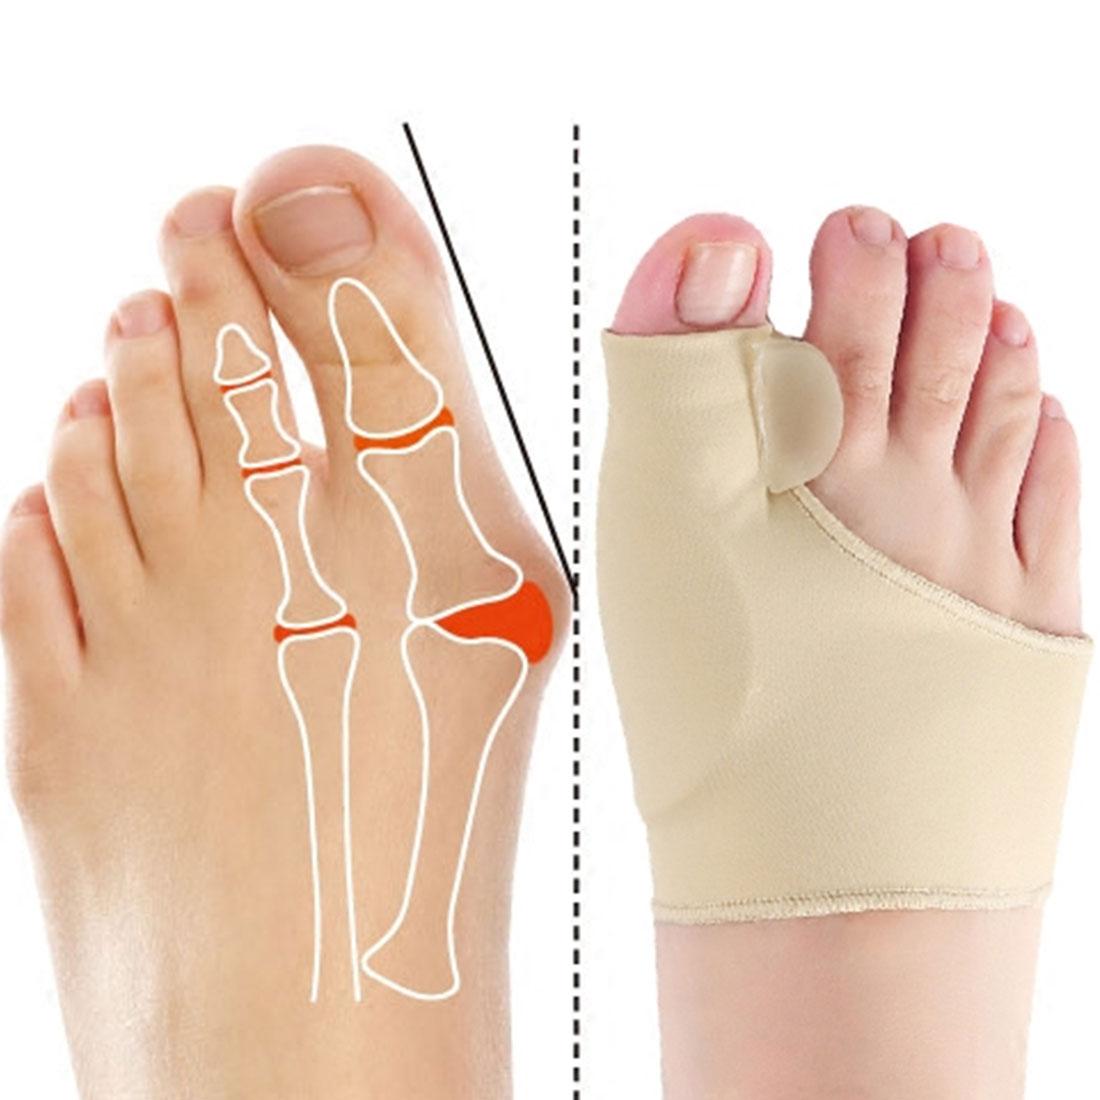 1Pair Big / Small Toe Corrector Orthotics Feet Foot Care Bone Thumb Adjuster Correction Soft Pedicure Socks Bunion Straightener